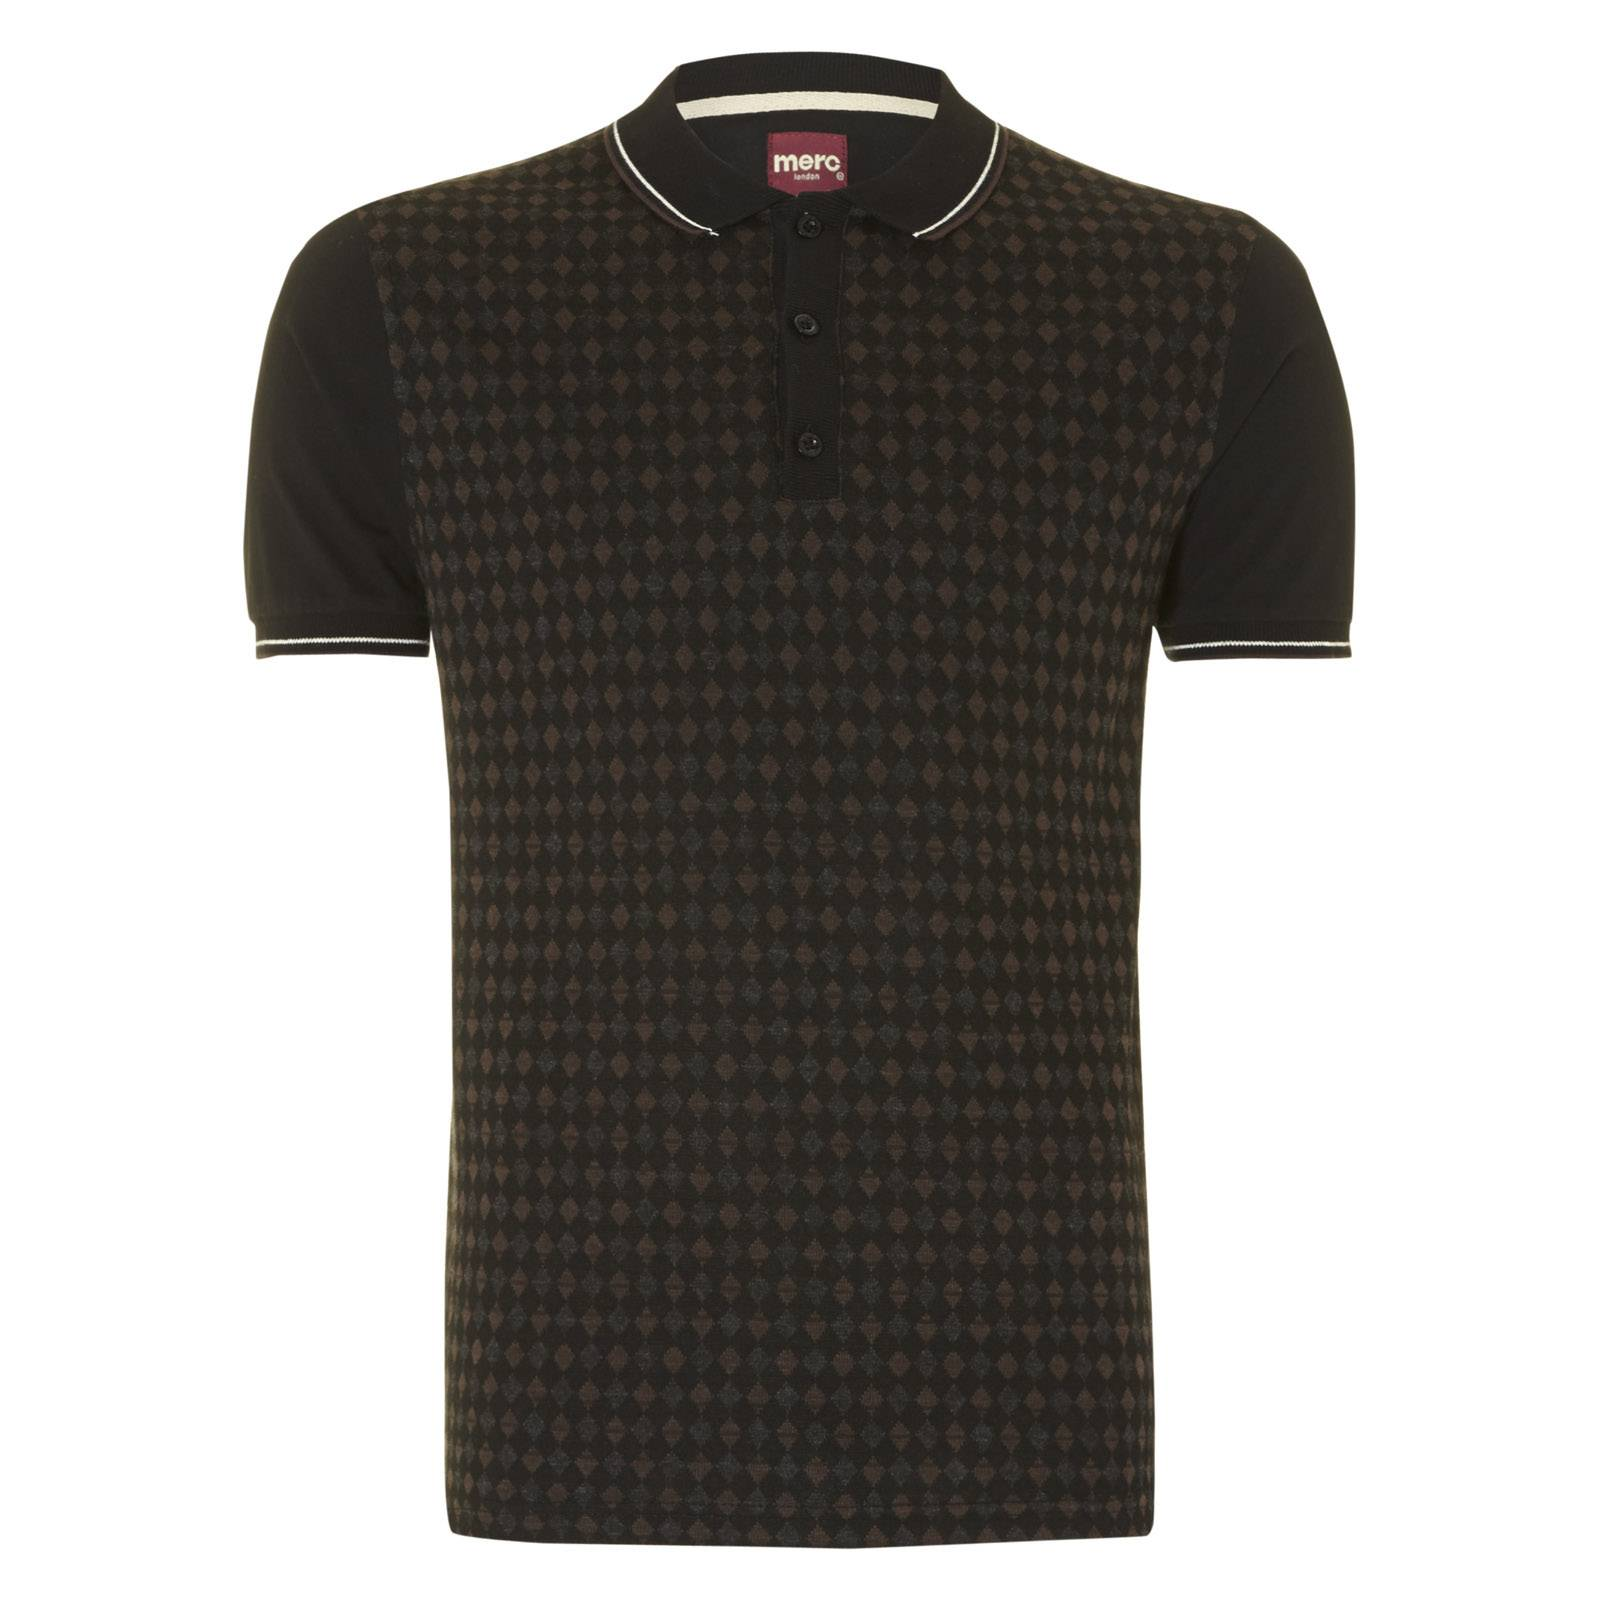 Рубашка Поло WareAW16 PROMO SALE<br><br><br>Артикул: 1914205<br>Материал: Передняя сторона - 60% полиэстер, 35% вискоза, 5% эластан; Задняя сторона - 100% хлопок<br>Цвет: темно-коричневый<br>Пол: Мужской